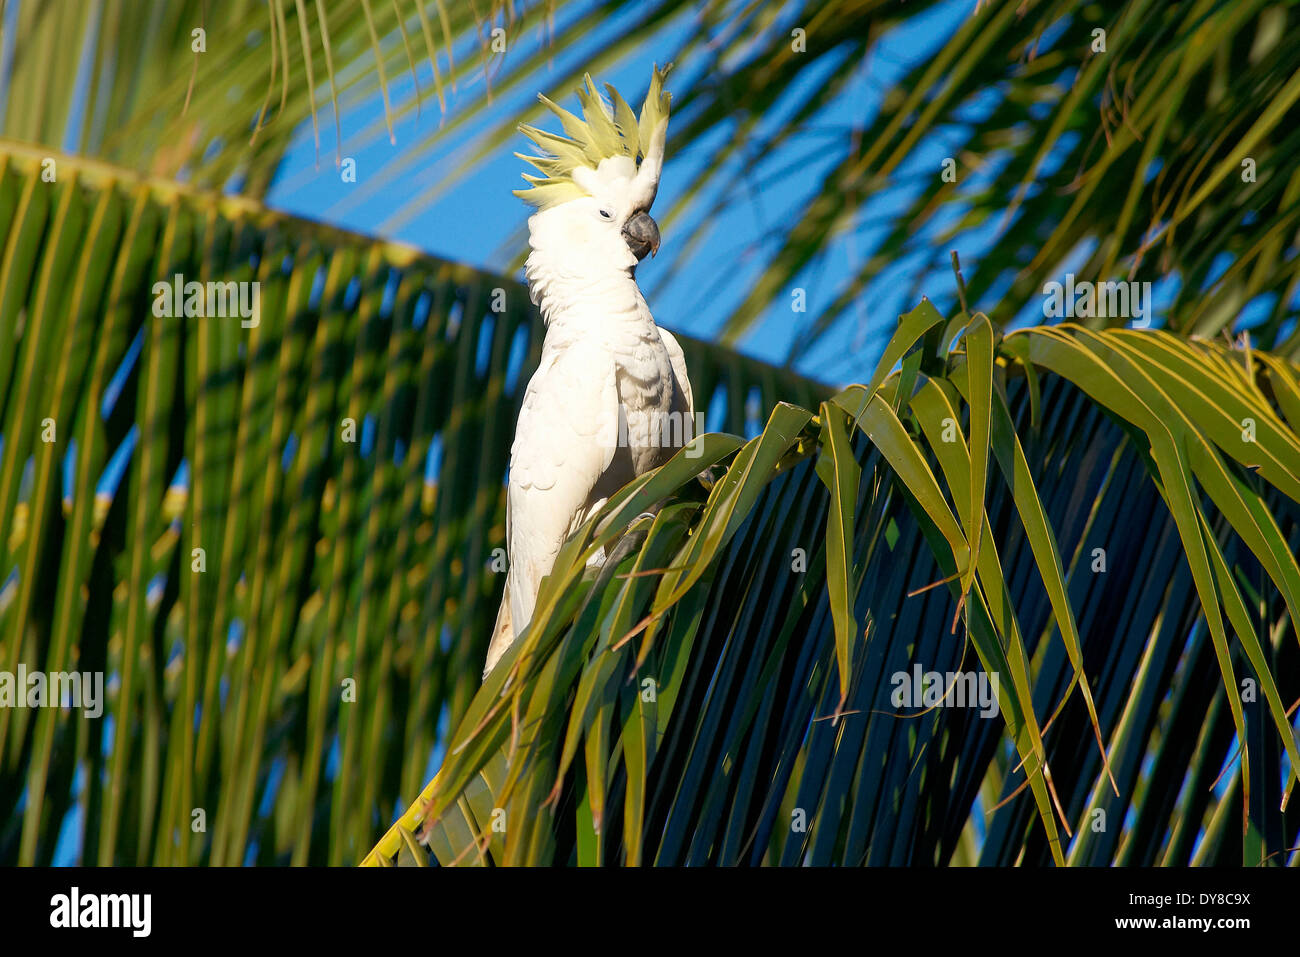 Australia, cockatoo, white, Queensland, animal, birds, Whitsunday Island - Stock Image